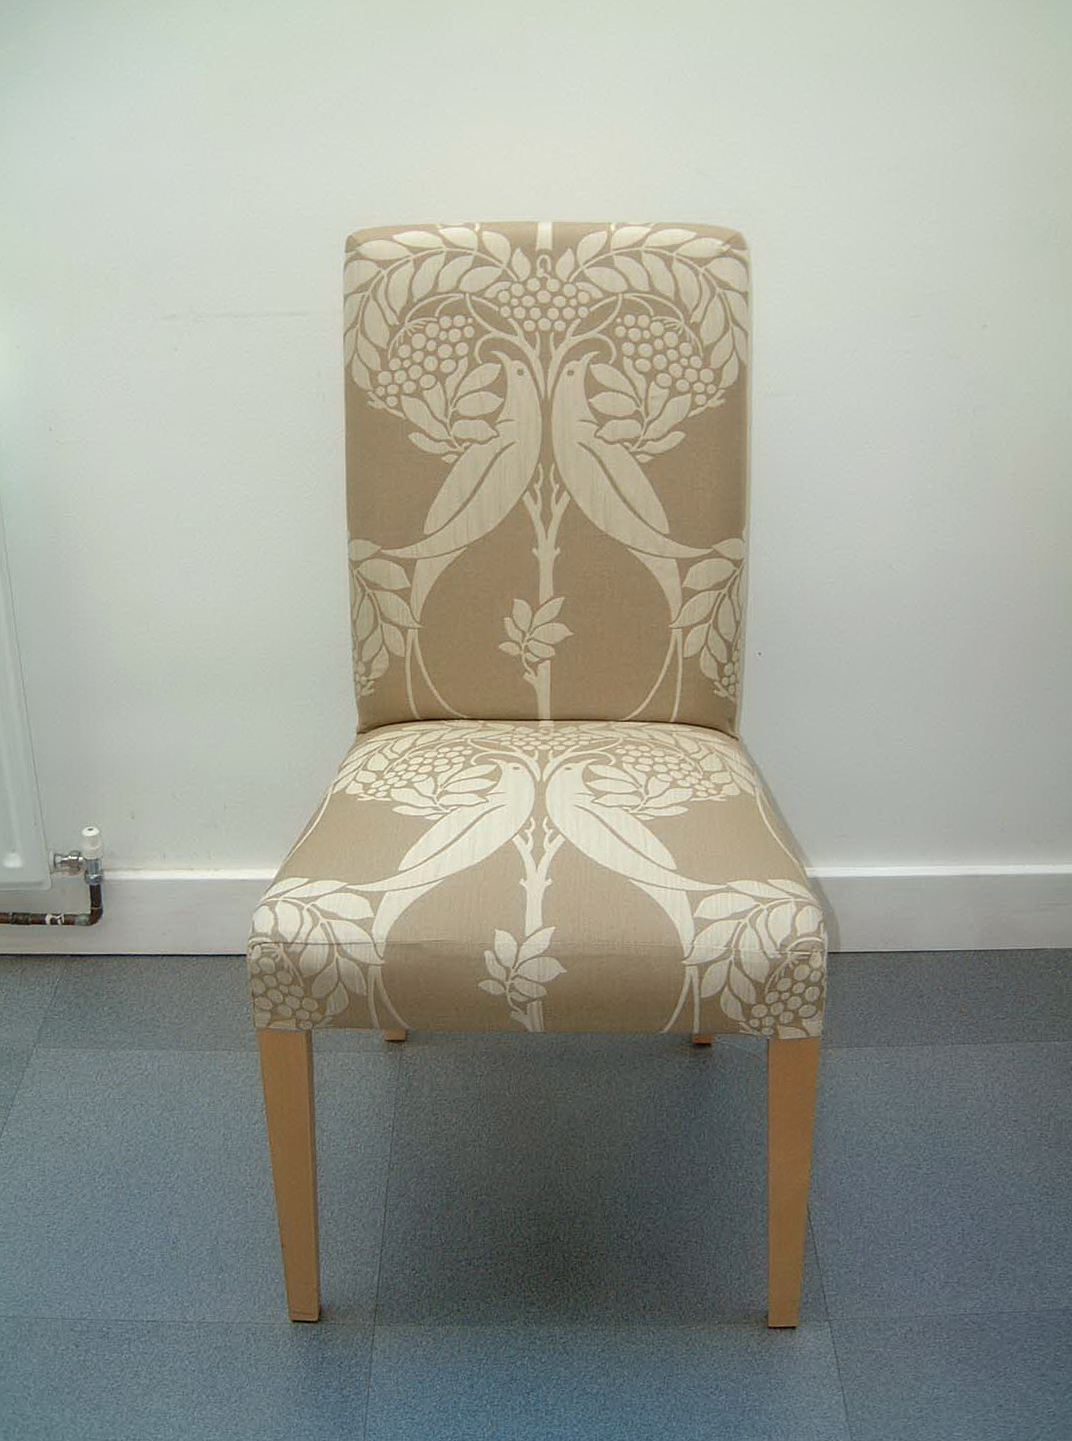 Dining Chair Cushions Ikea Home Design Ideas : dining chair cushions ikea from www.theenergylibrary.com size 1072 x 1441 jpeg 342kB